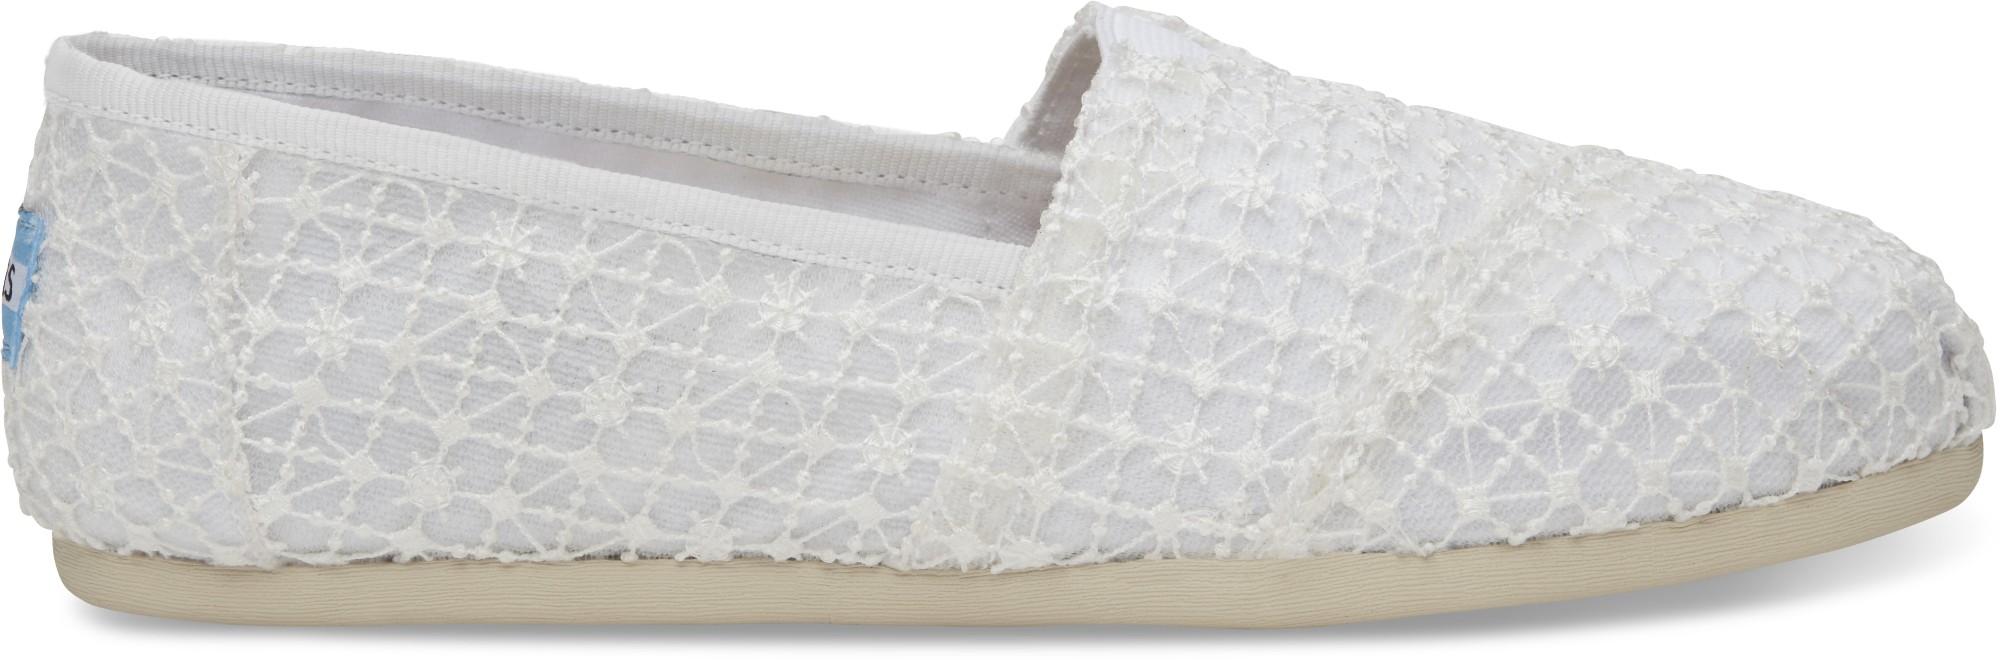 TOMS Crochet Lace Women's Alpargata White 39